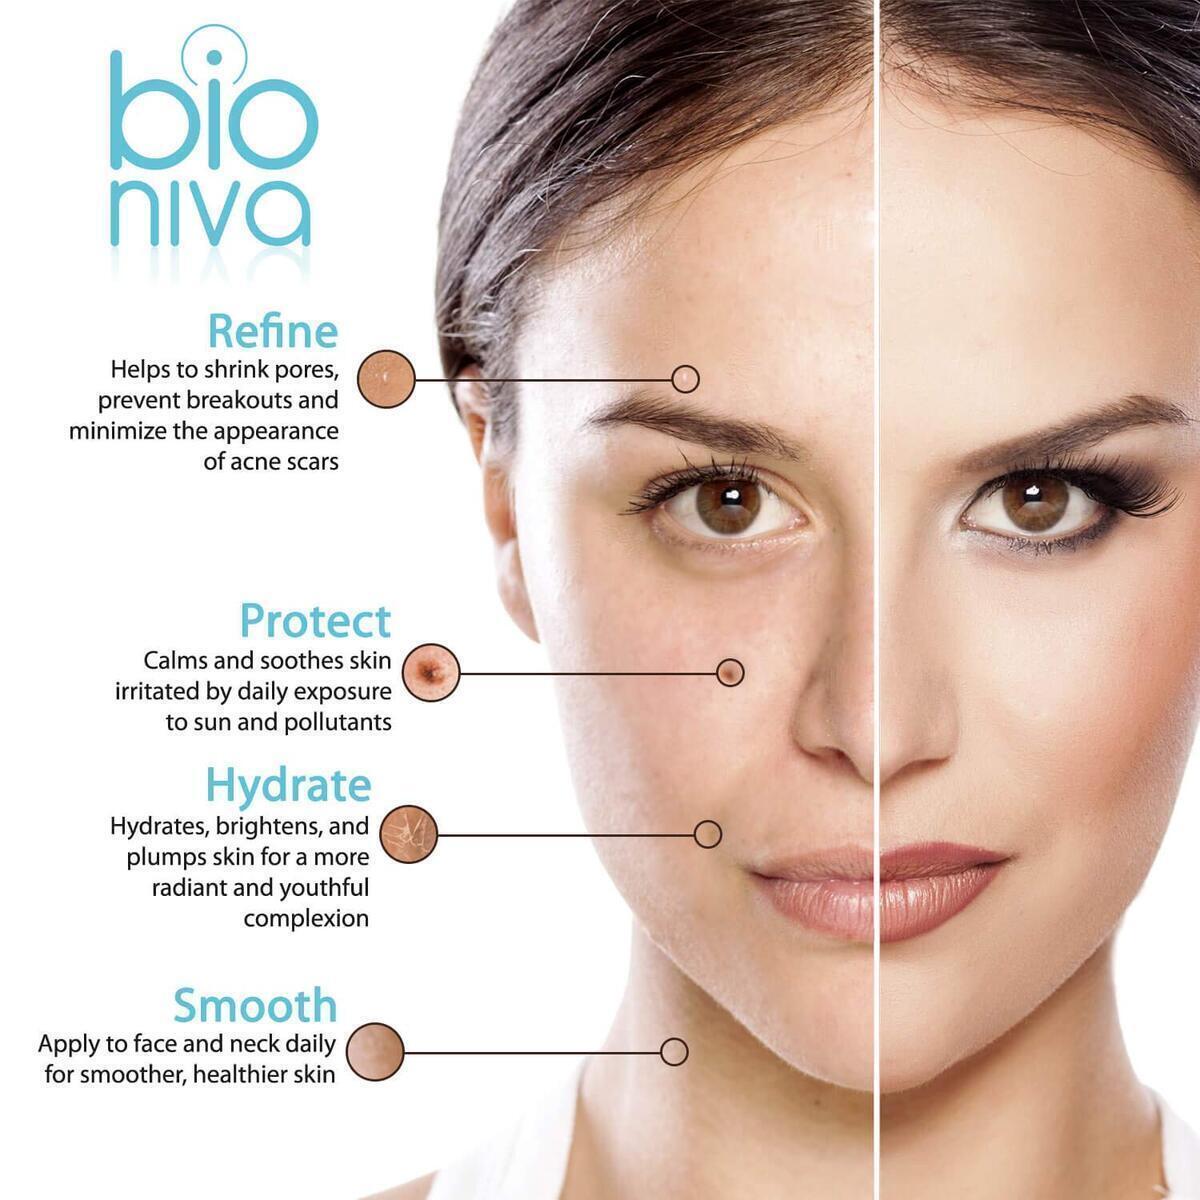 Bioniva Hyaluronic Acid Serum with Vitamin C, Green Tea & Vitamin E